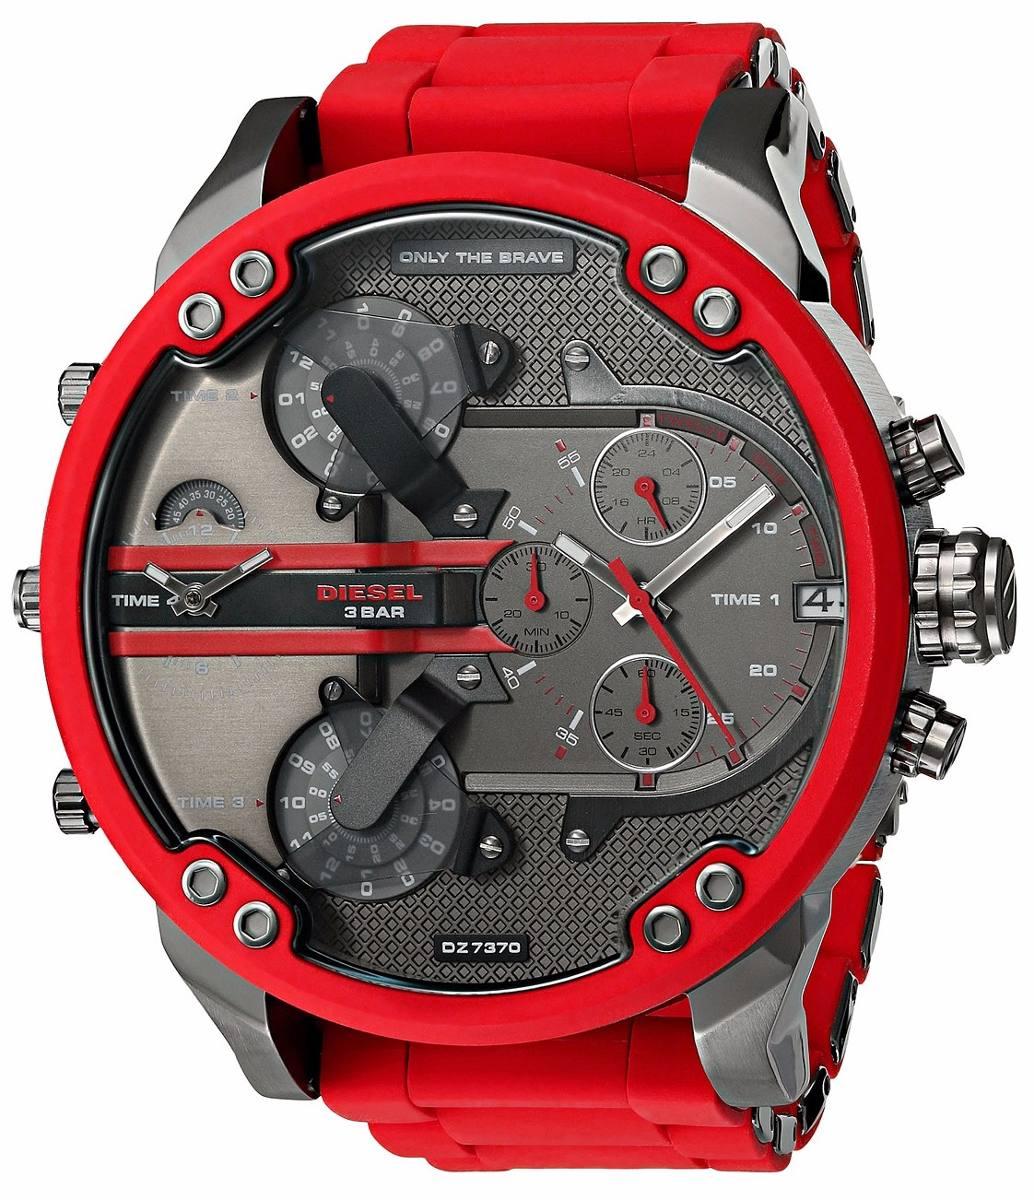 Relógio Diesel 3 BAR - Vermelho